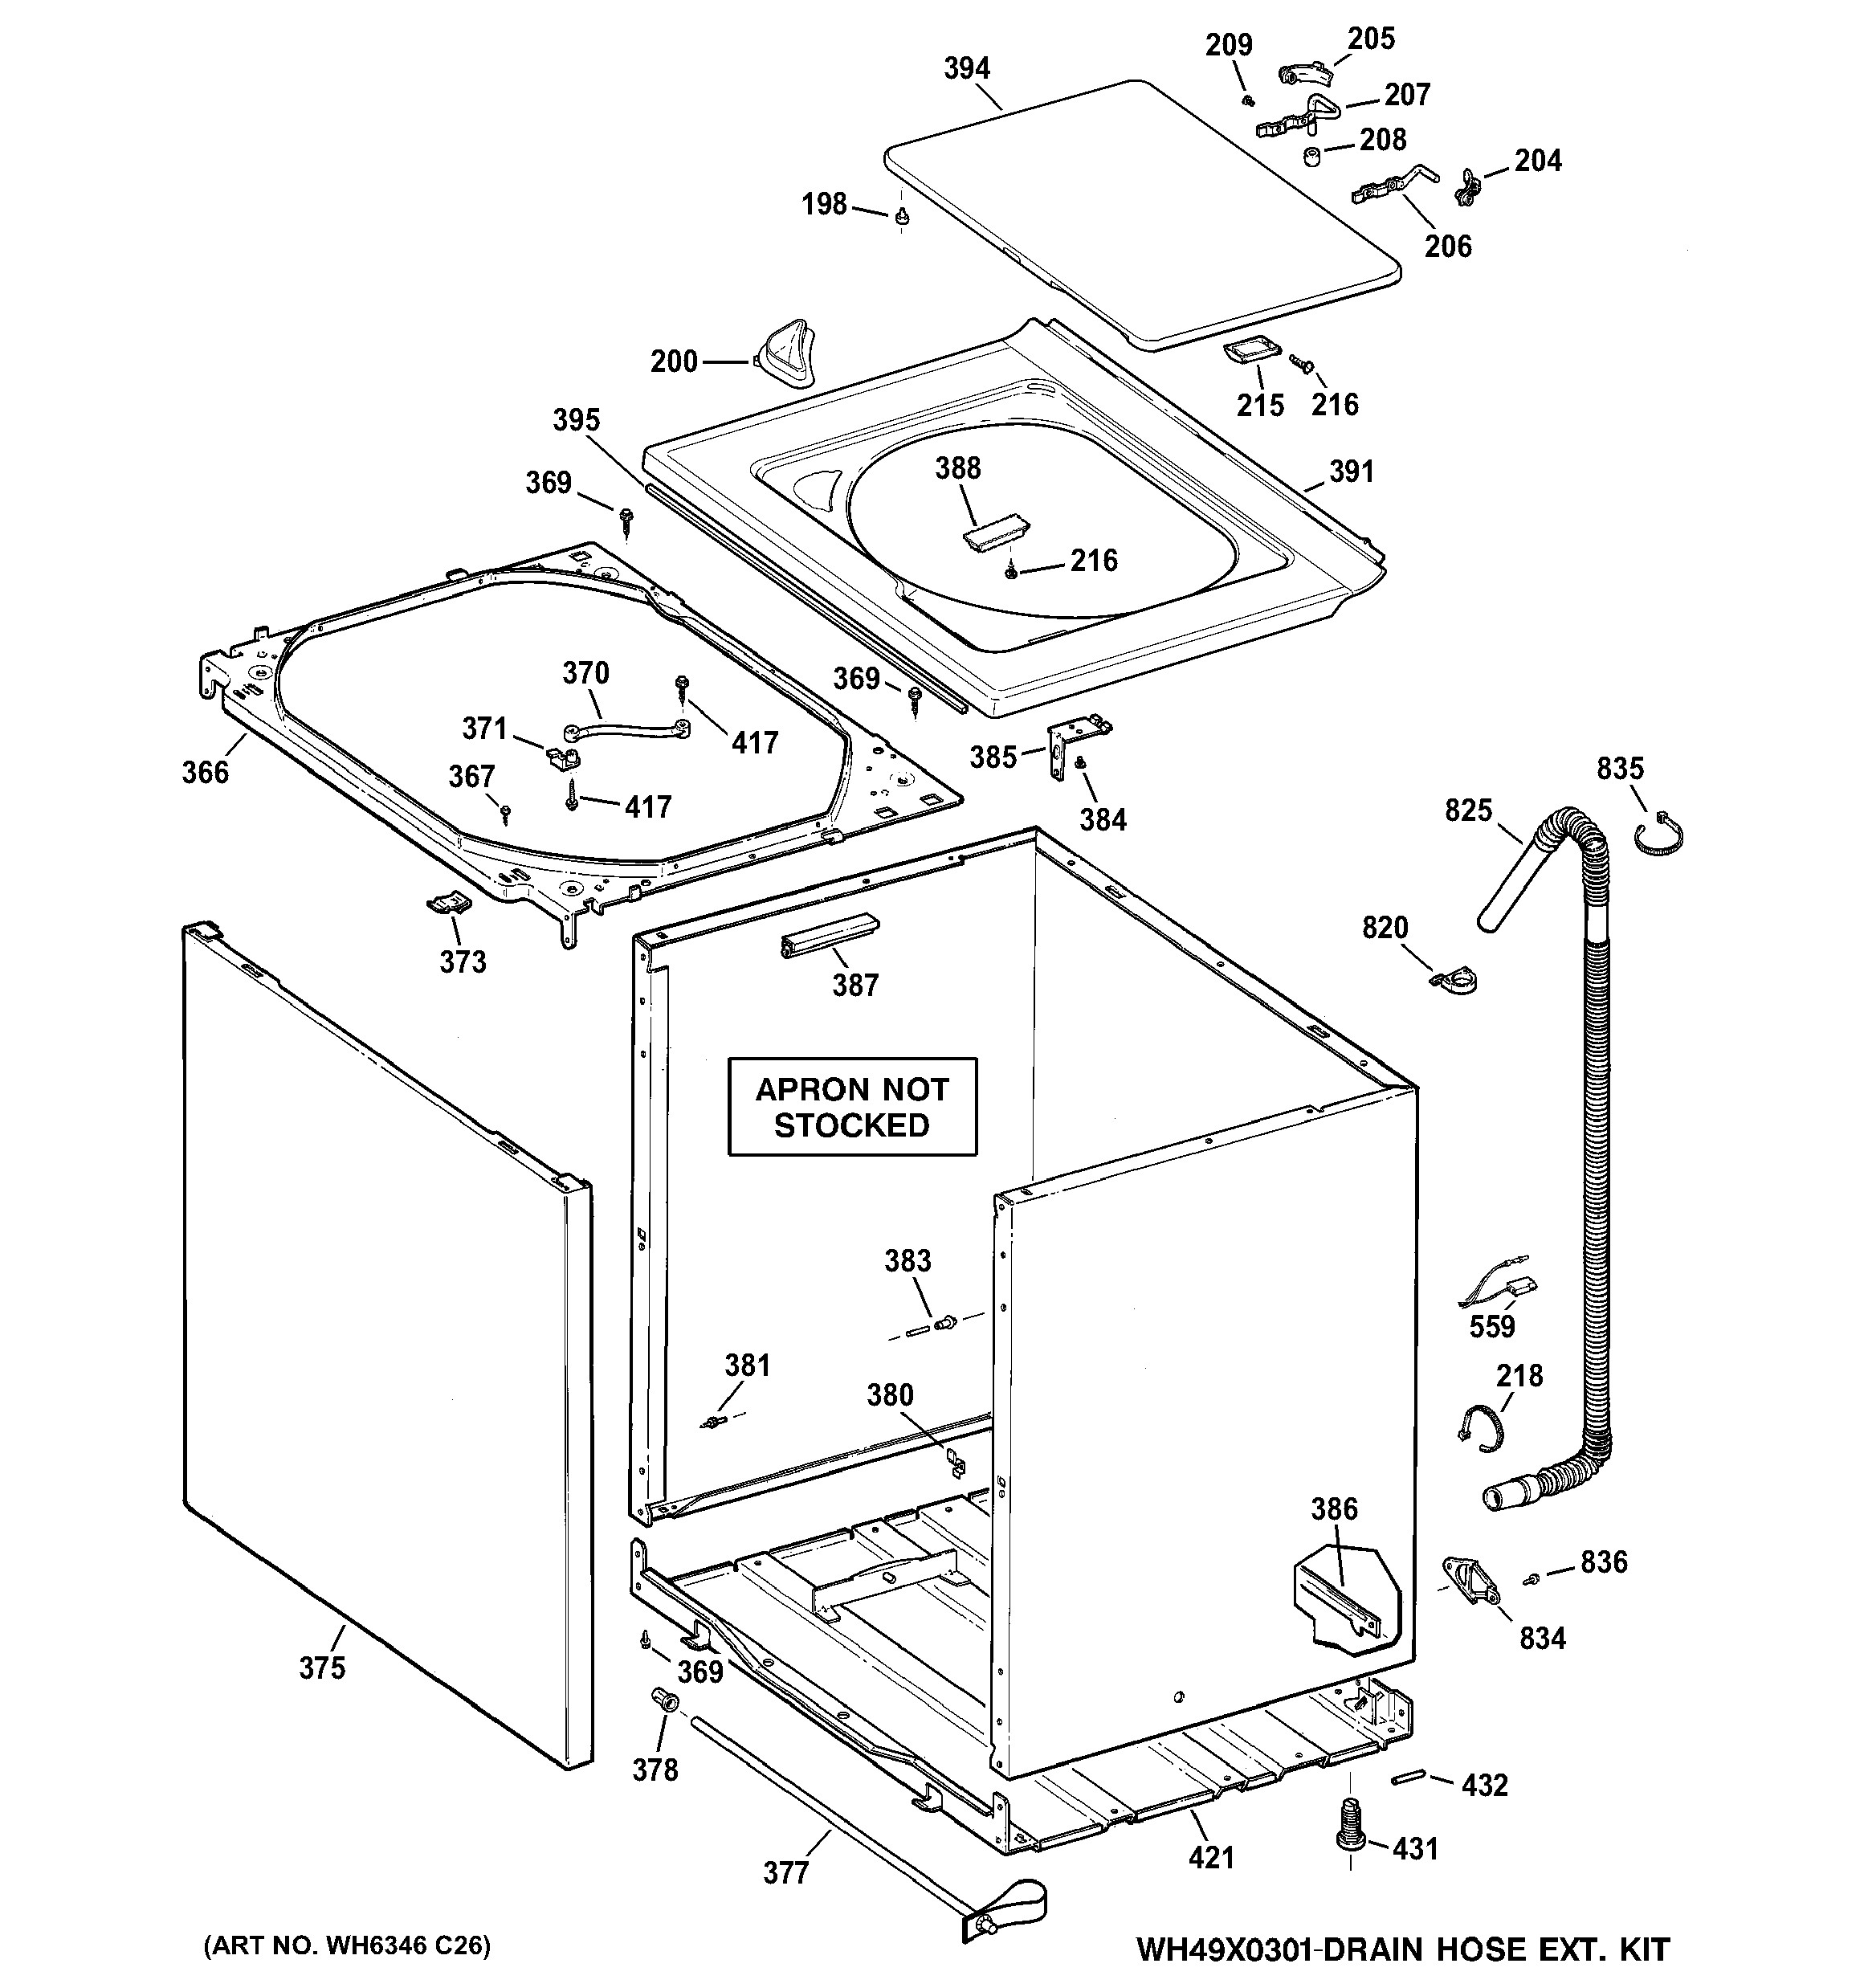 ge dryer parts diagram wiring diagram in addition roper